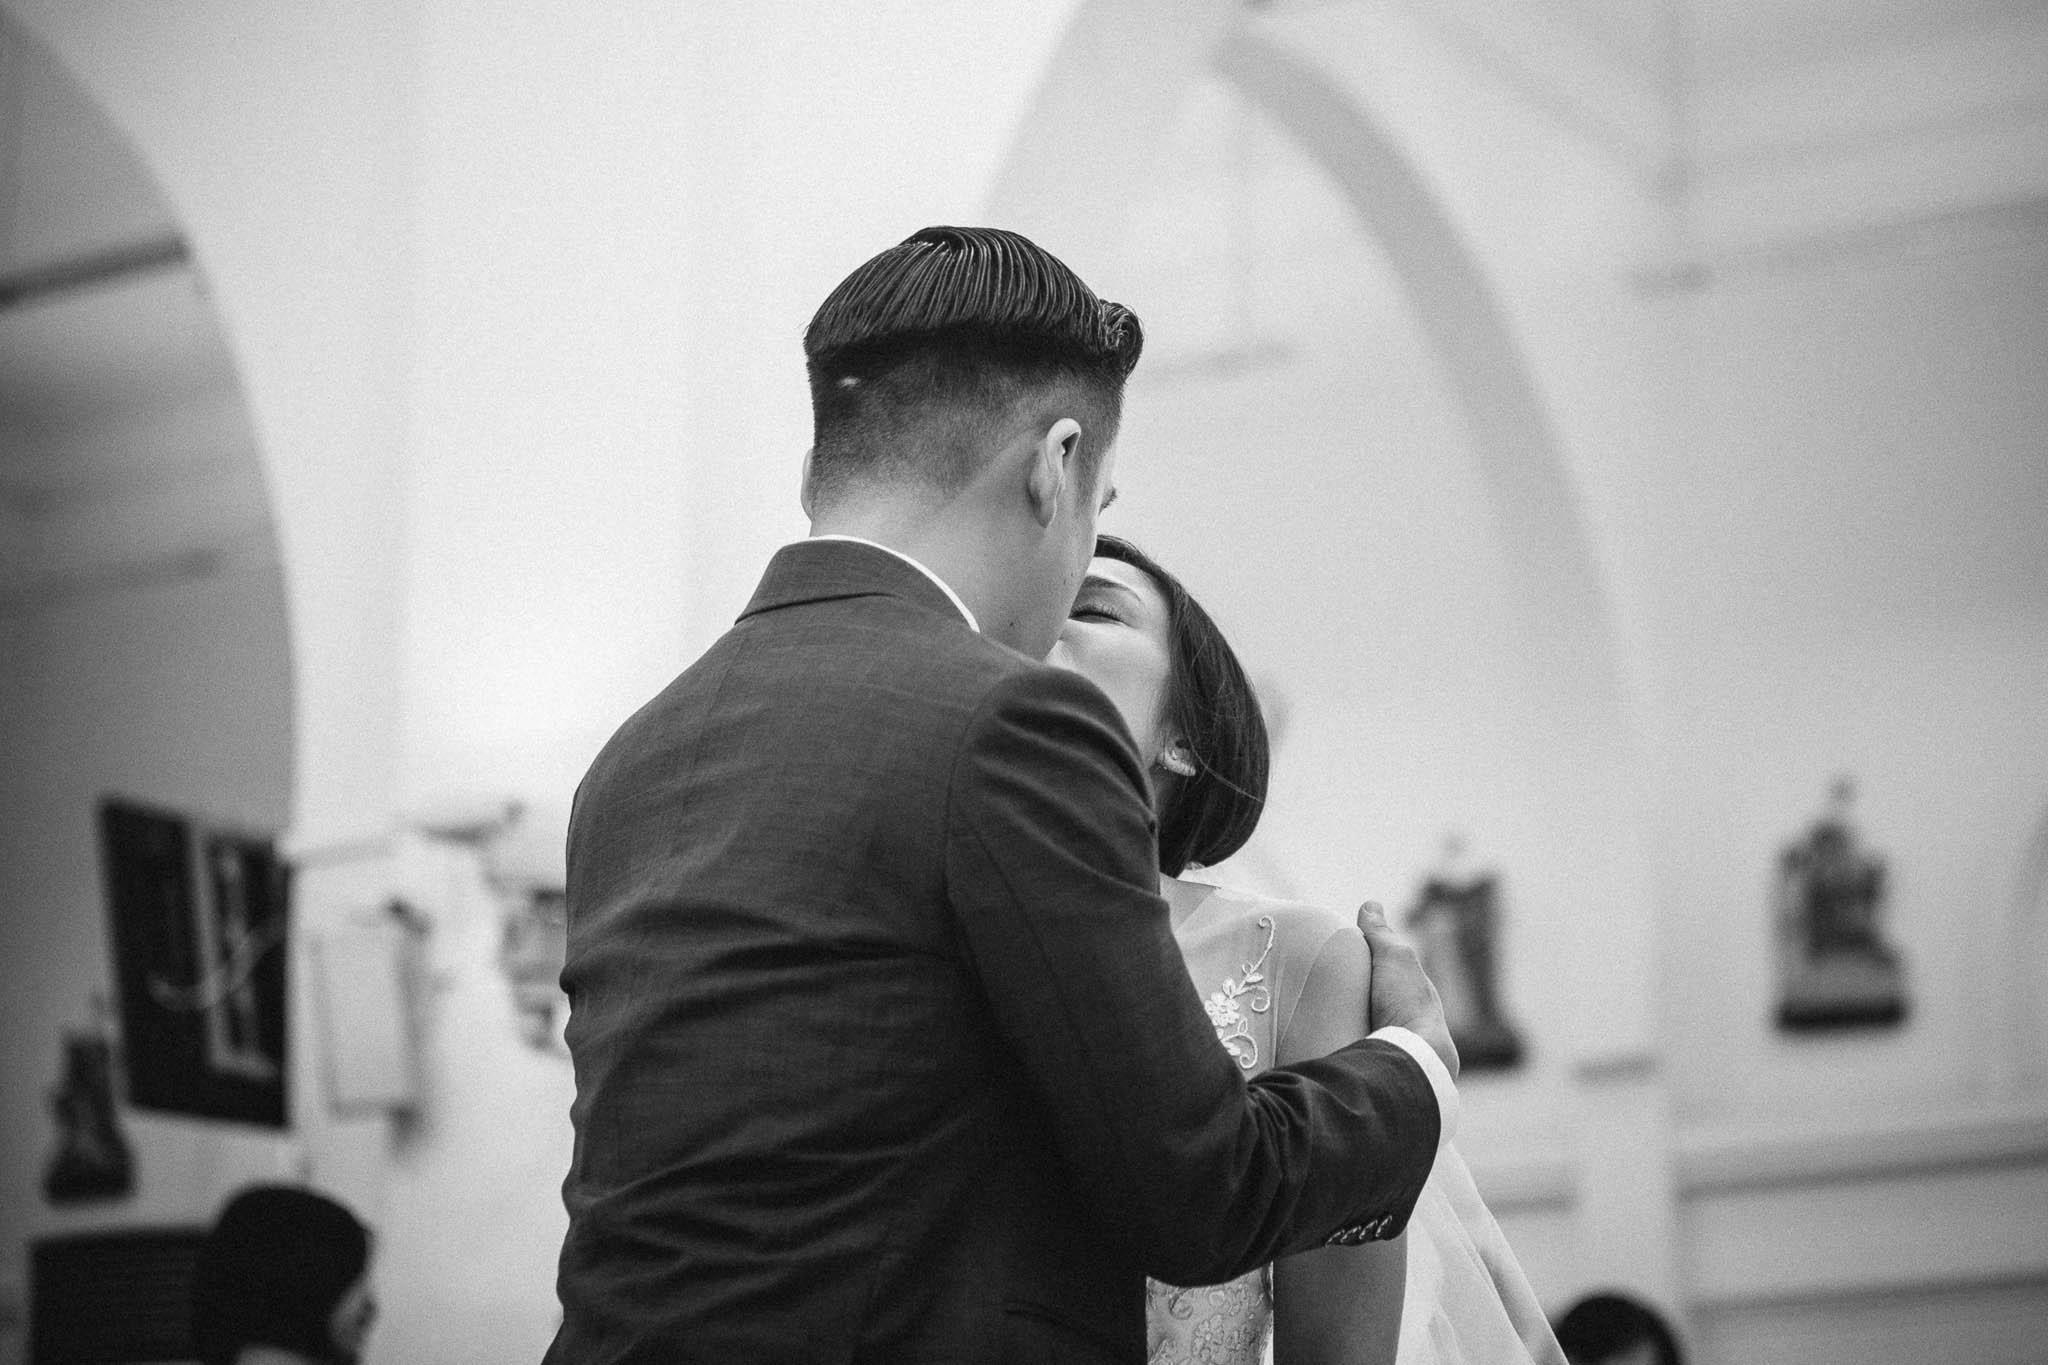 singapore-wedding-photographer-malay-indian-pre-wedding-travel-wmt-2015-36.jpg